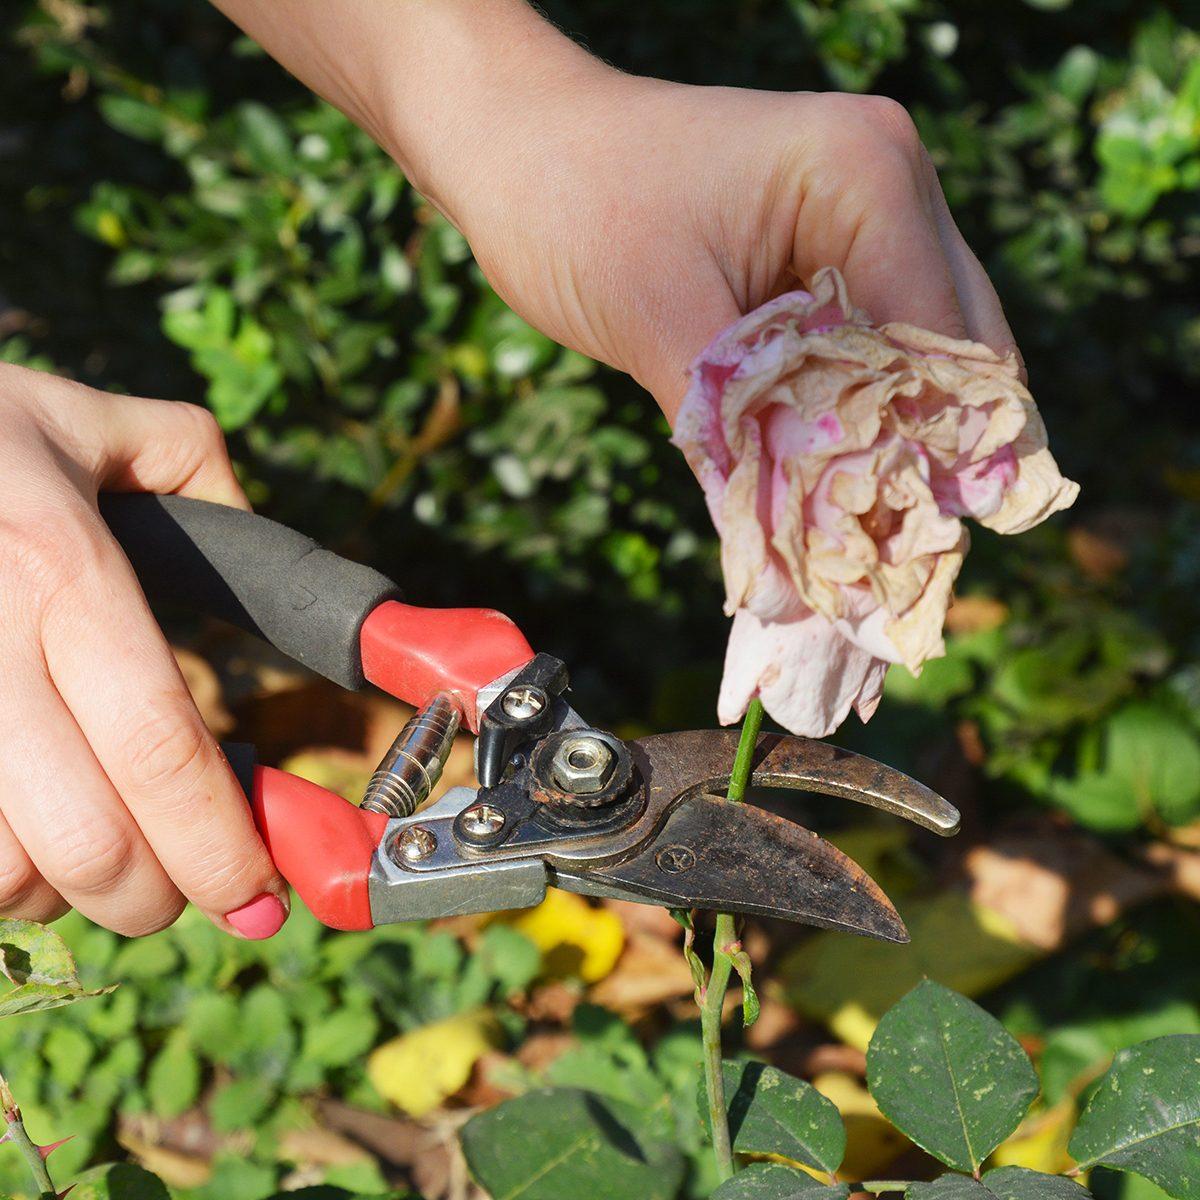 Cutting a dead flower